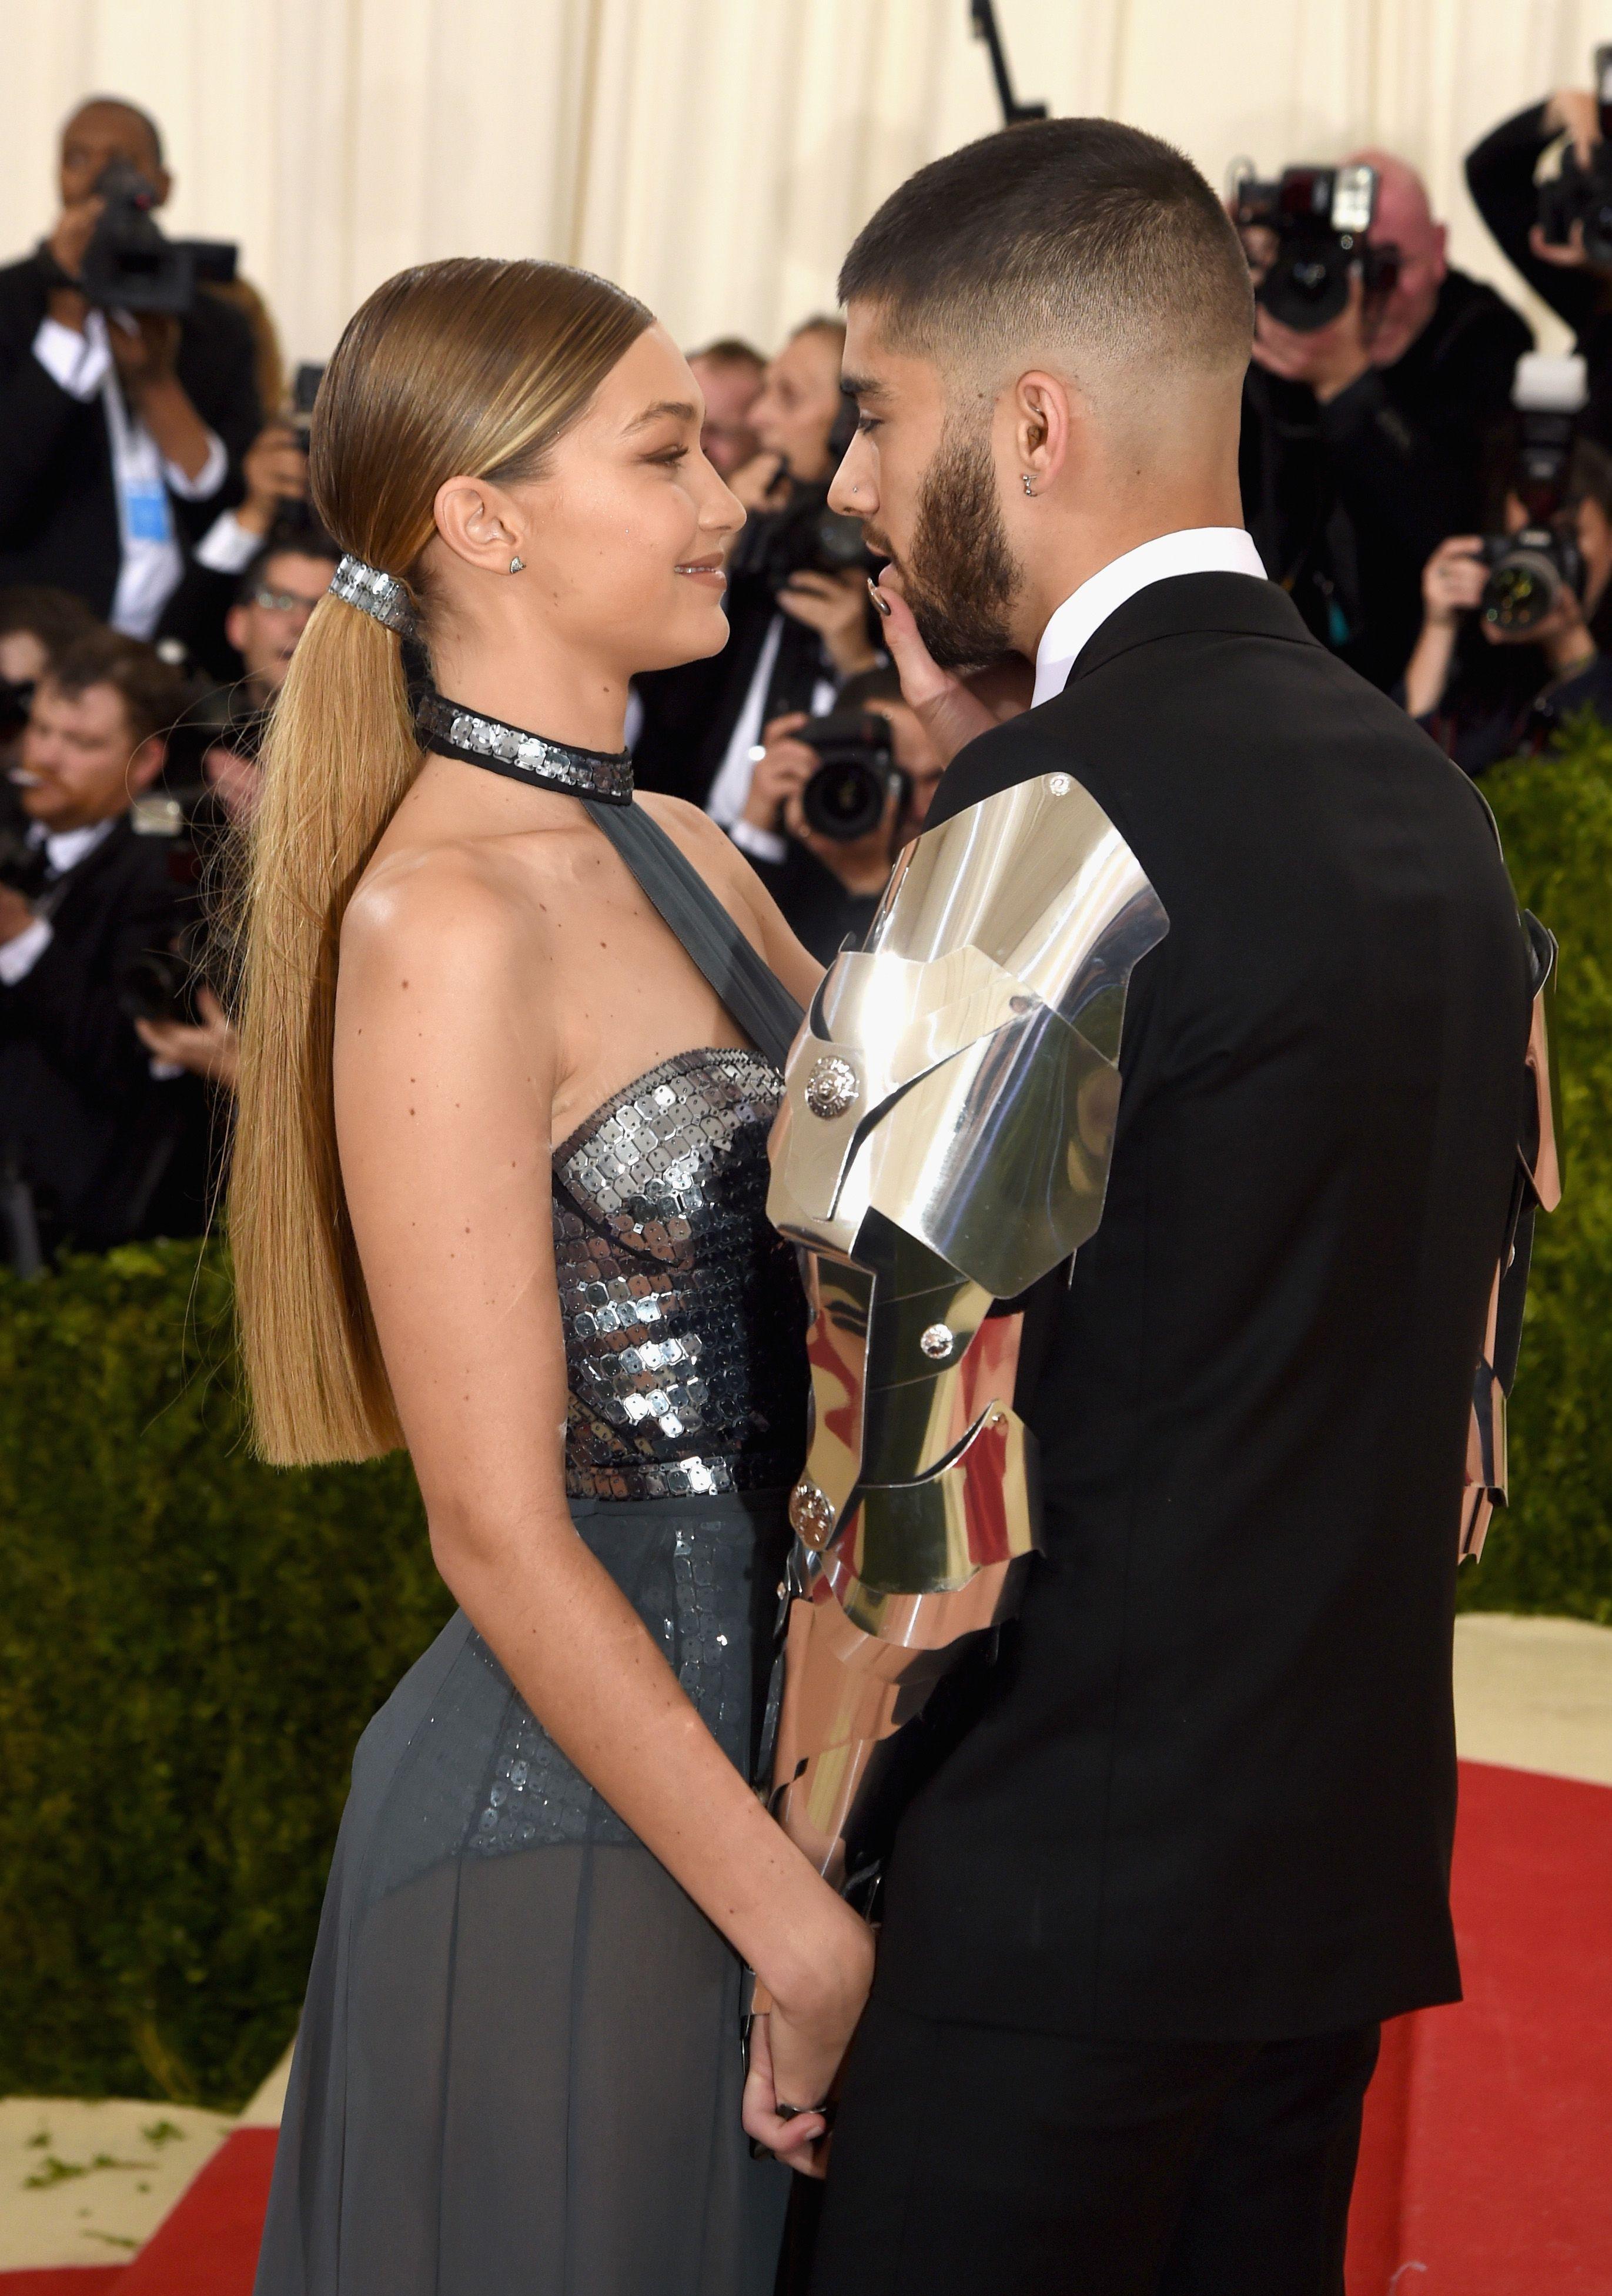 Zayn Malik dan Gigi Hadid kembali putus, gimana pendapat kalian? (dok. Cosmopolitan)